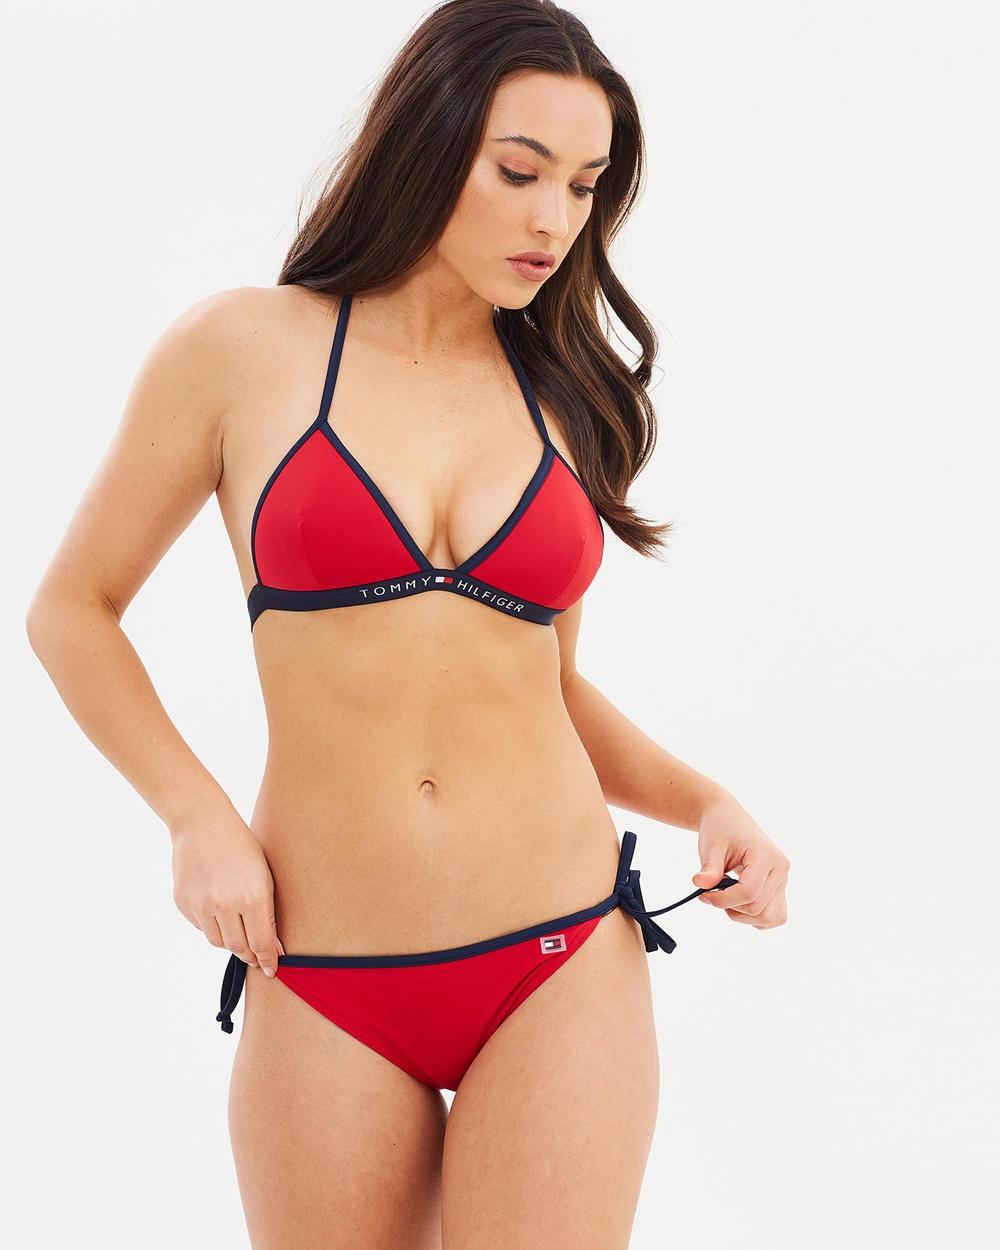 Tommy Hilfiger Cheeky String Side Tie Bikini Bikini Bottoms Tango Red & Navy Blazer Cheeky String Side Tie Bikini